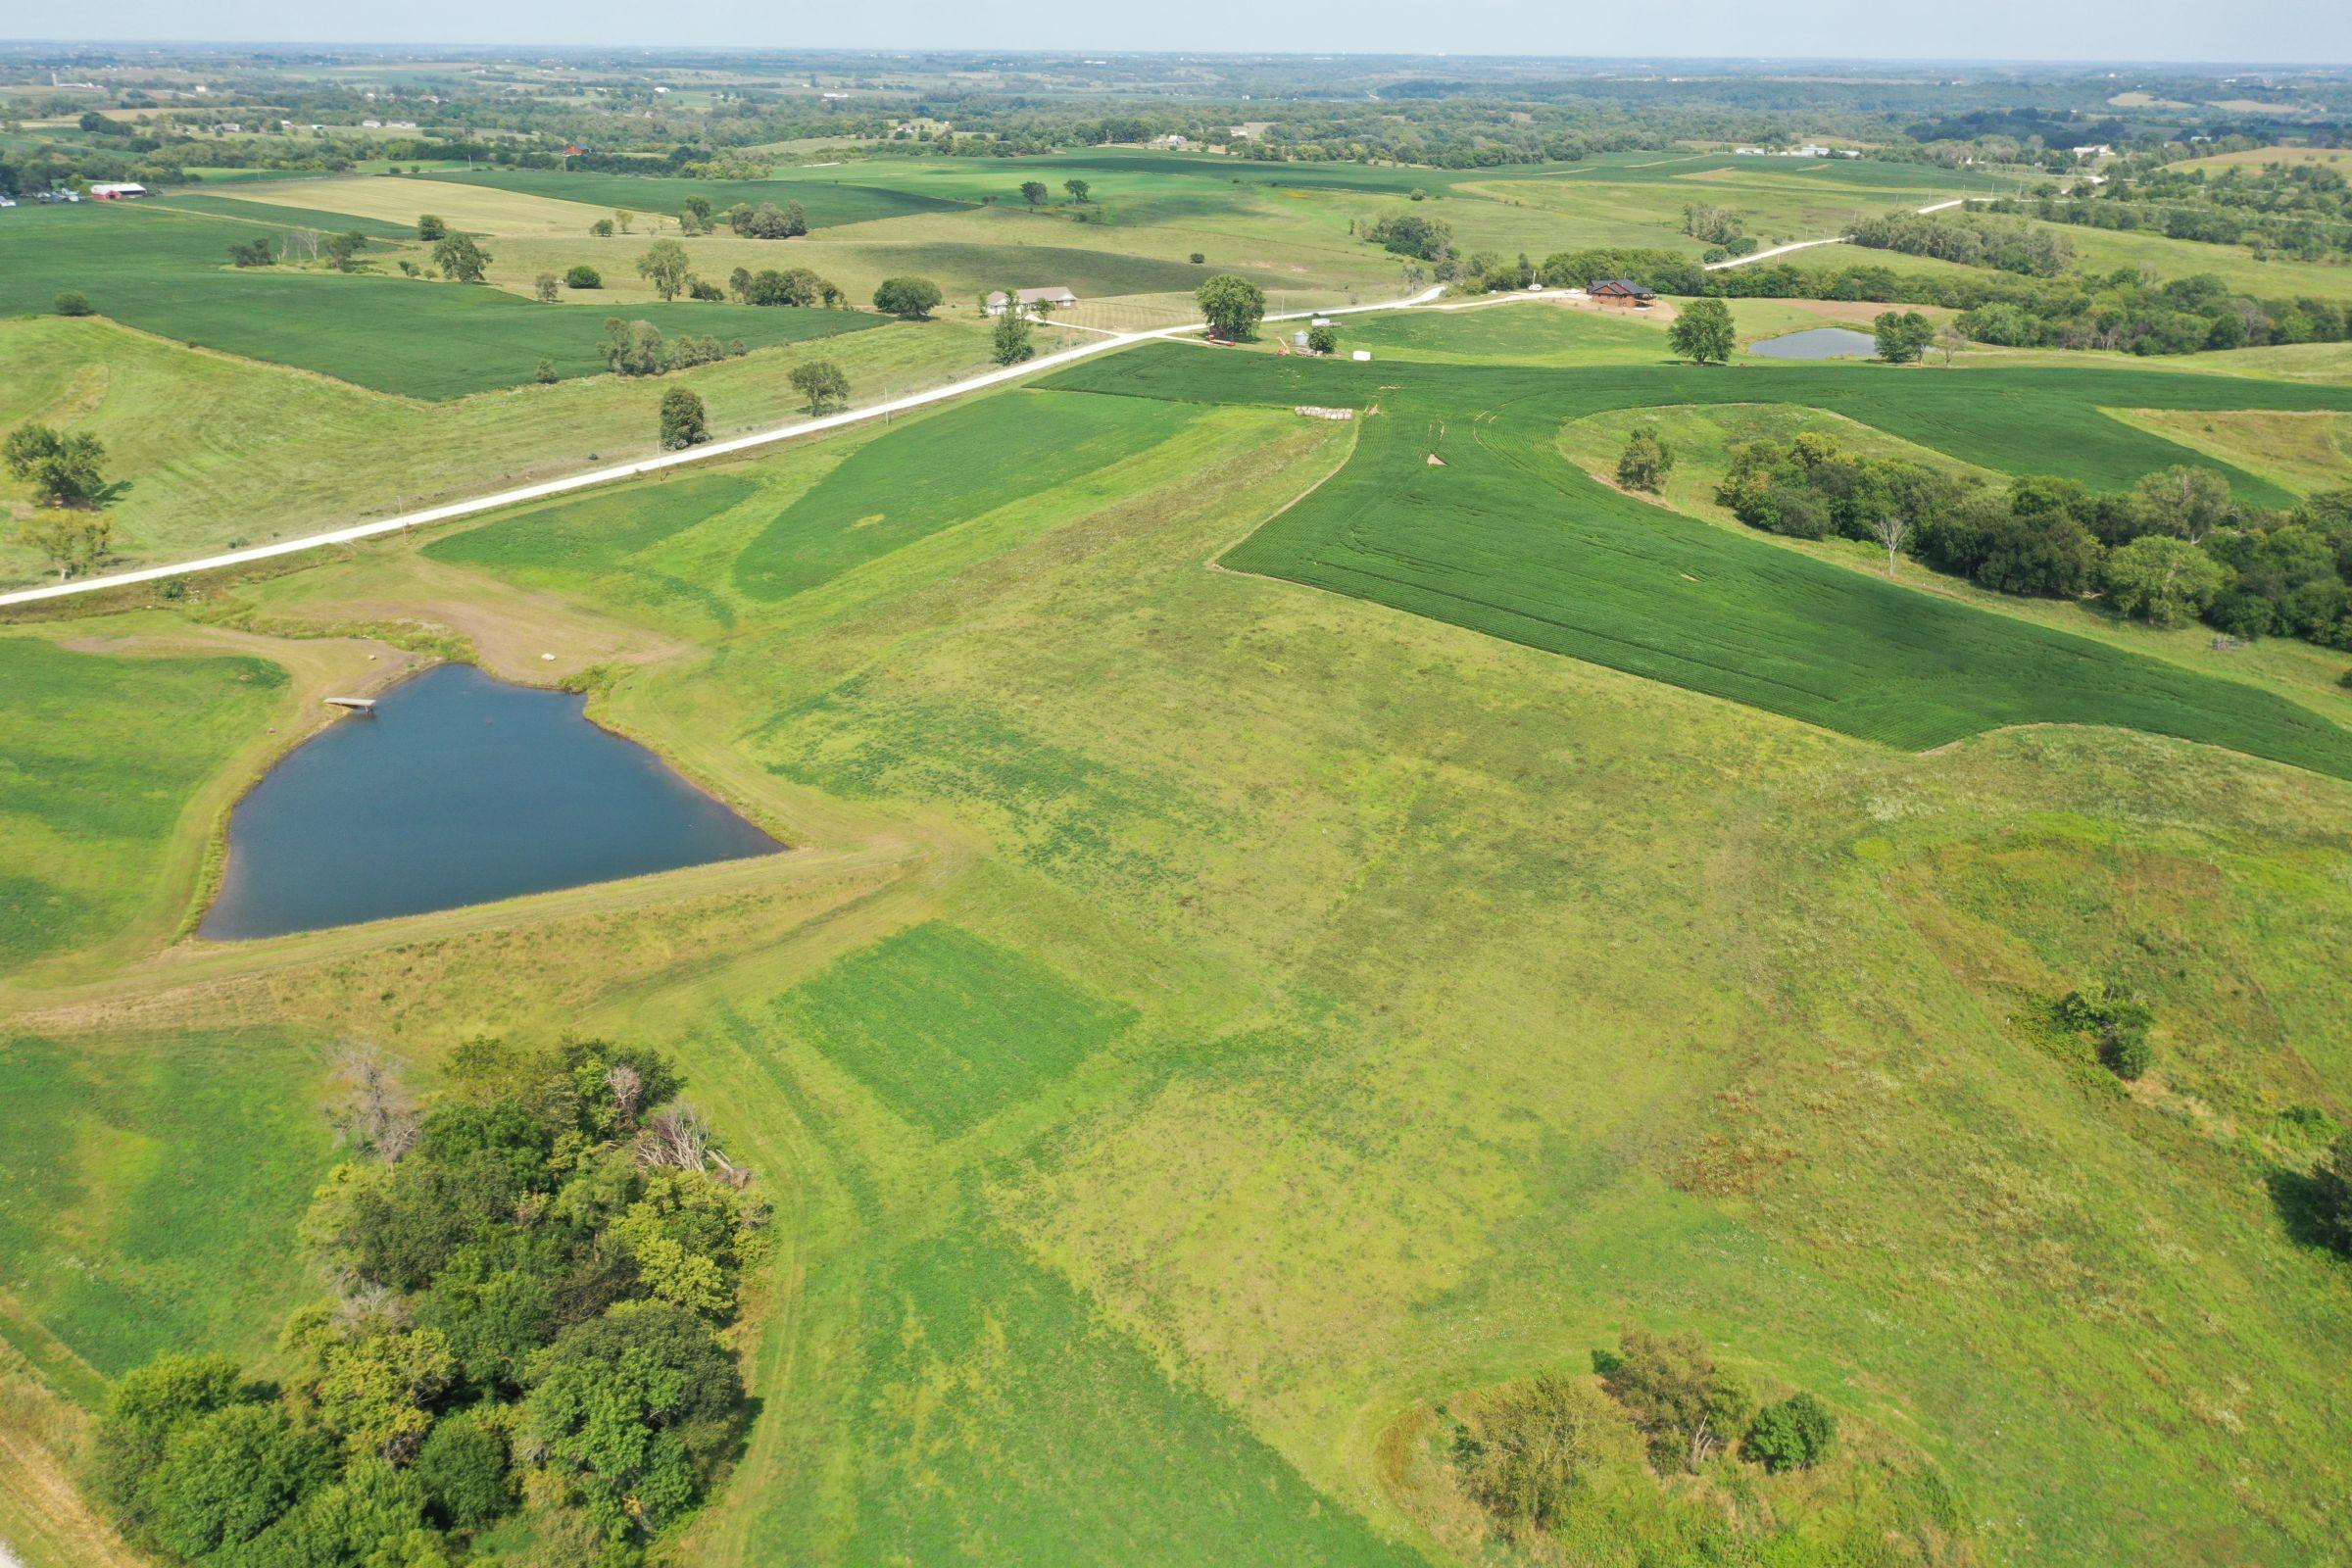 land-warren-county-iowa-12-acres-listing-number-15694-3-2021-08-20-170725.JPG